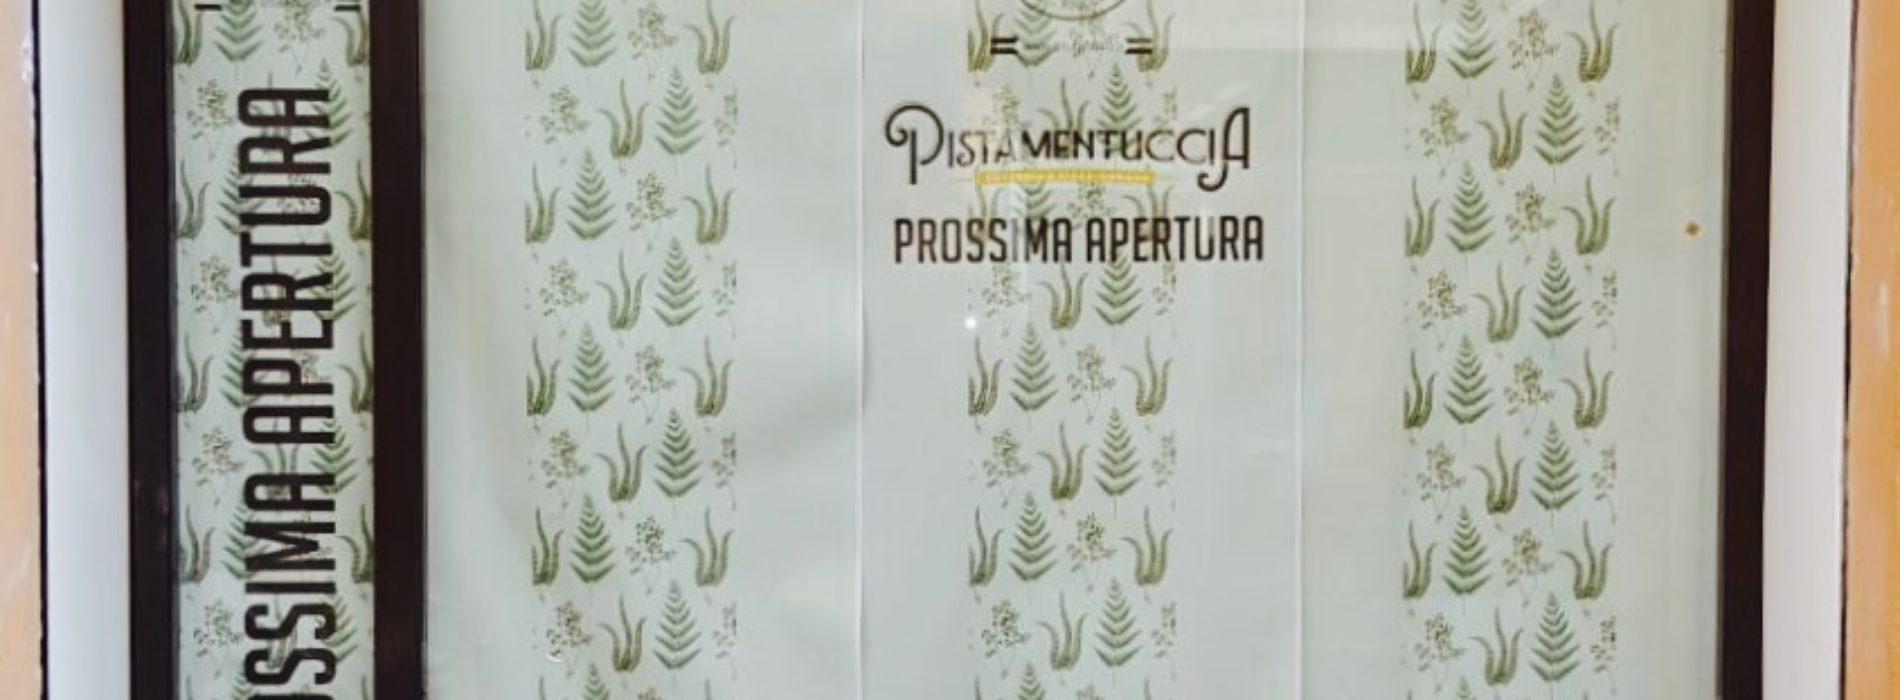 Cucina Componibili 500 Euro In Puglia